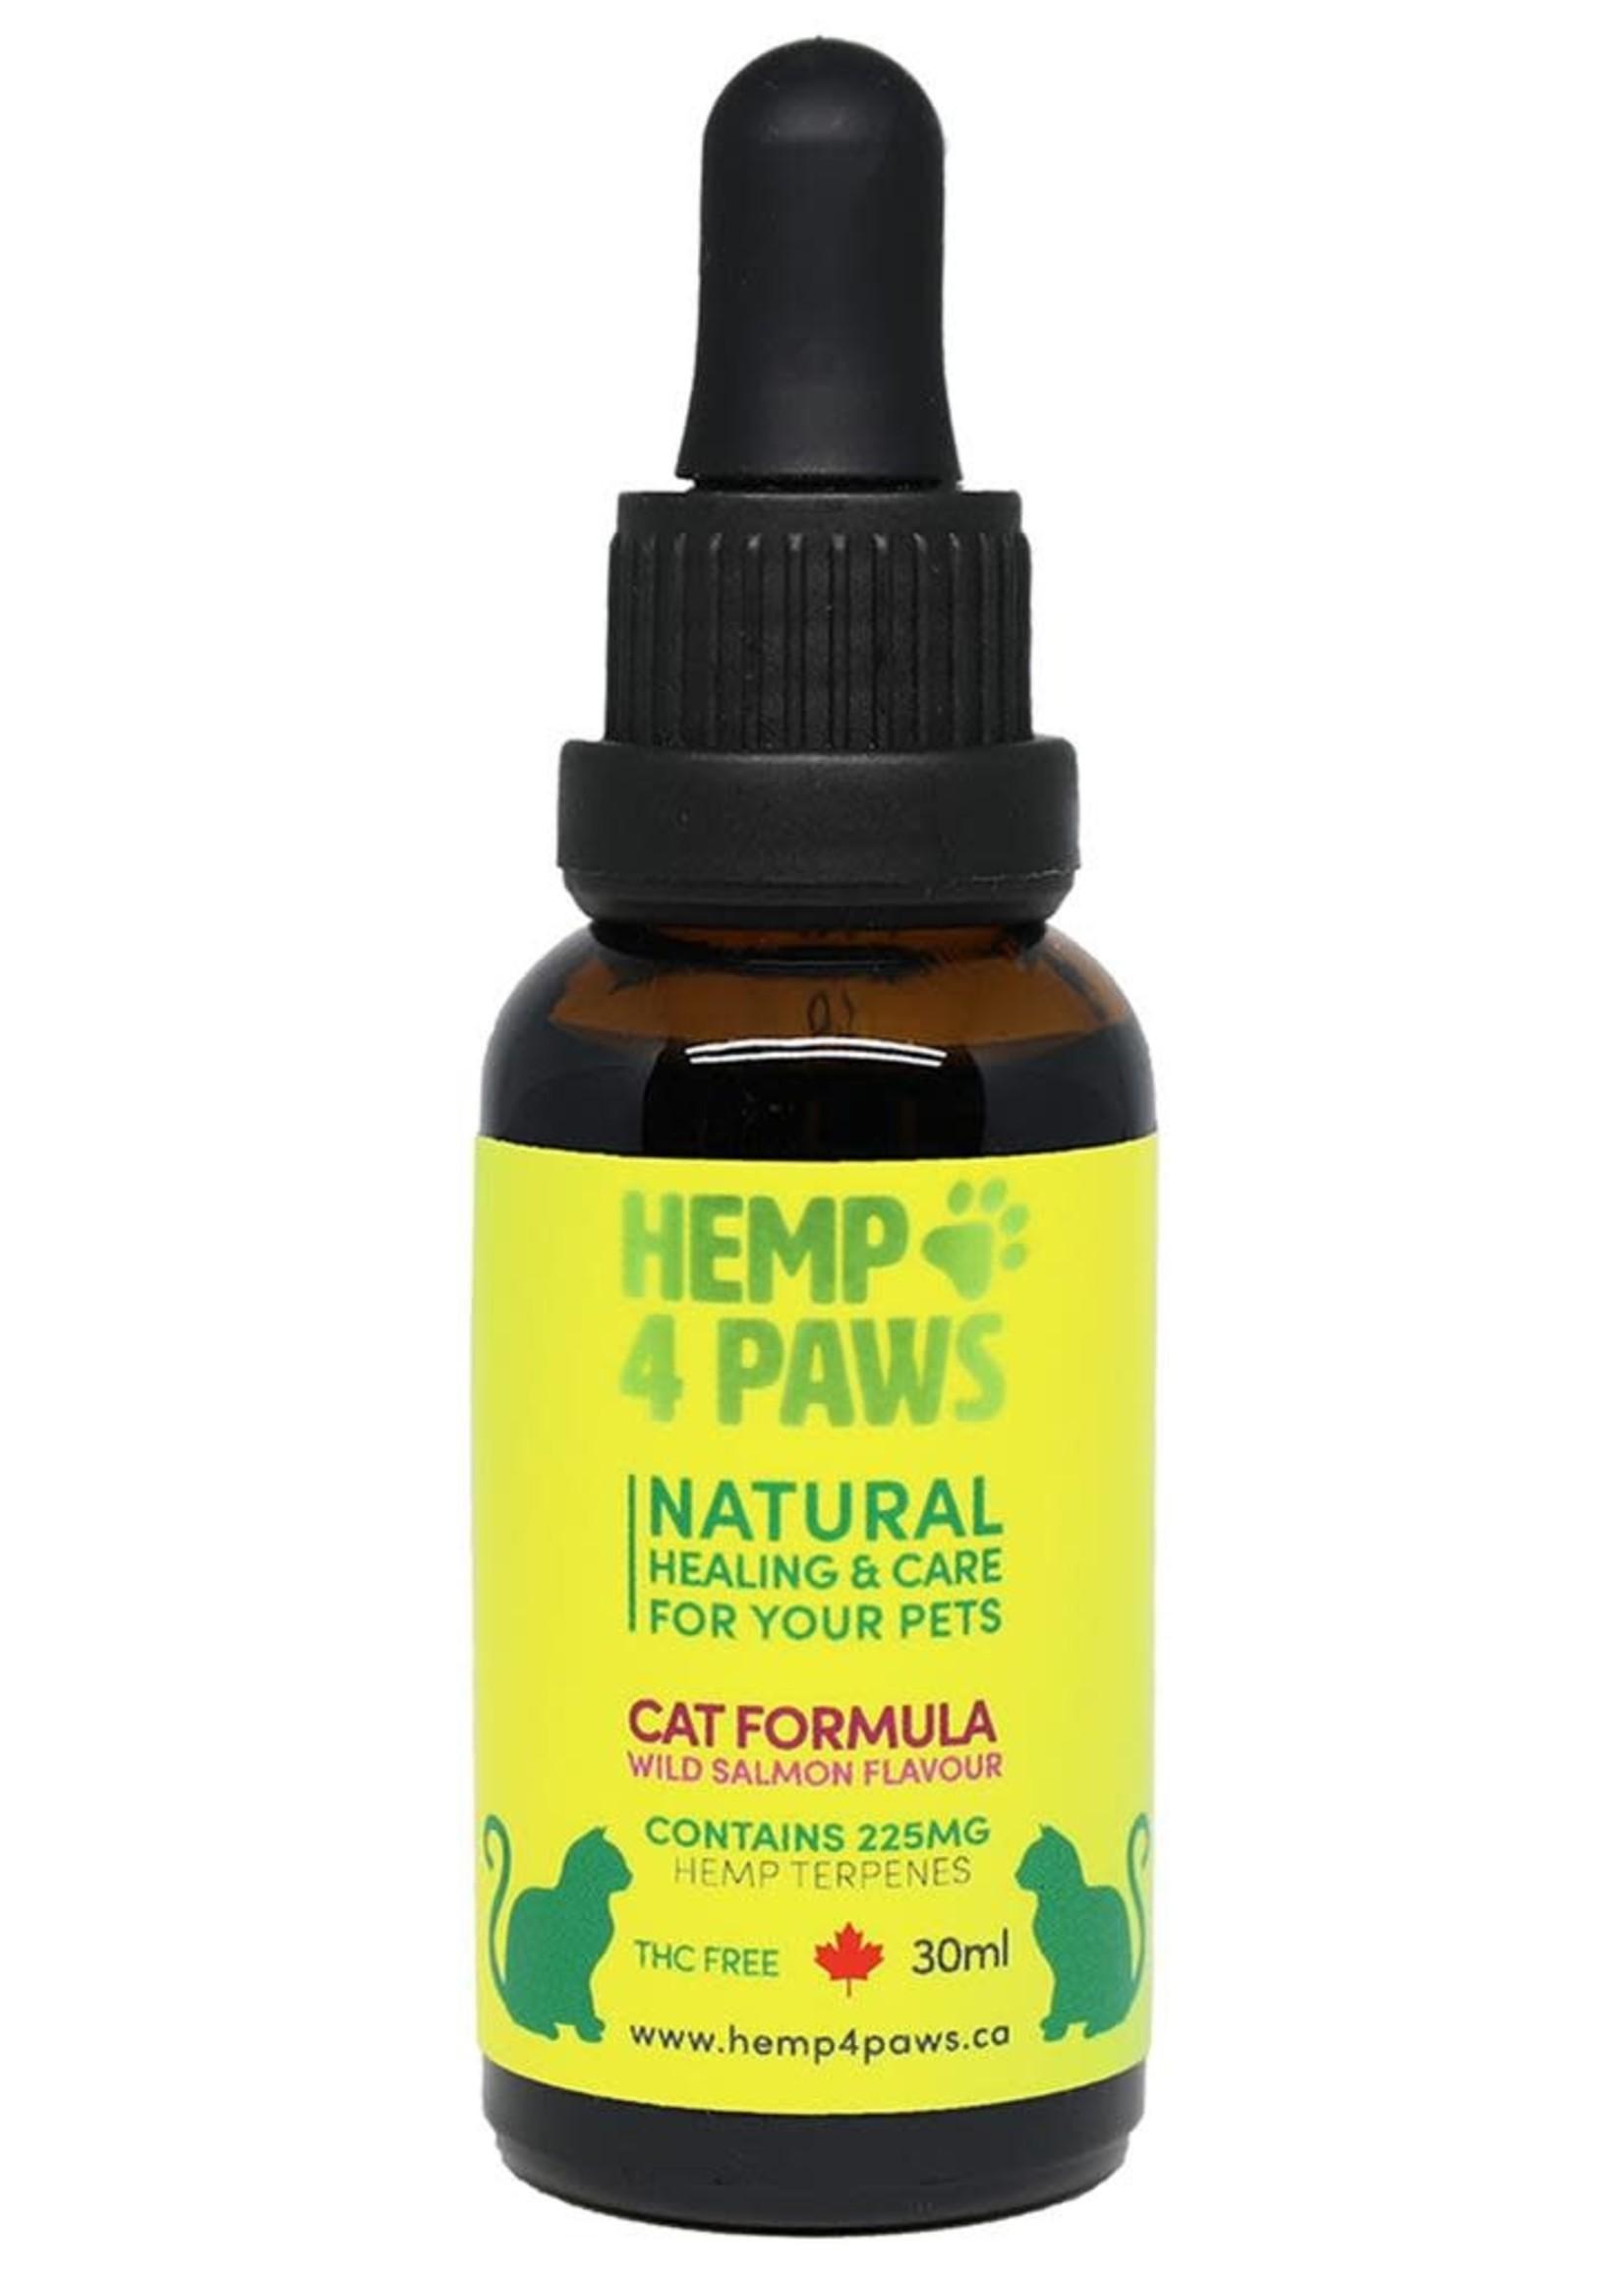 Hemp 4 Paws Hemp Seed Oil Wild Salmon Flavour